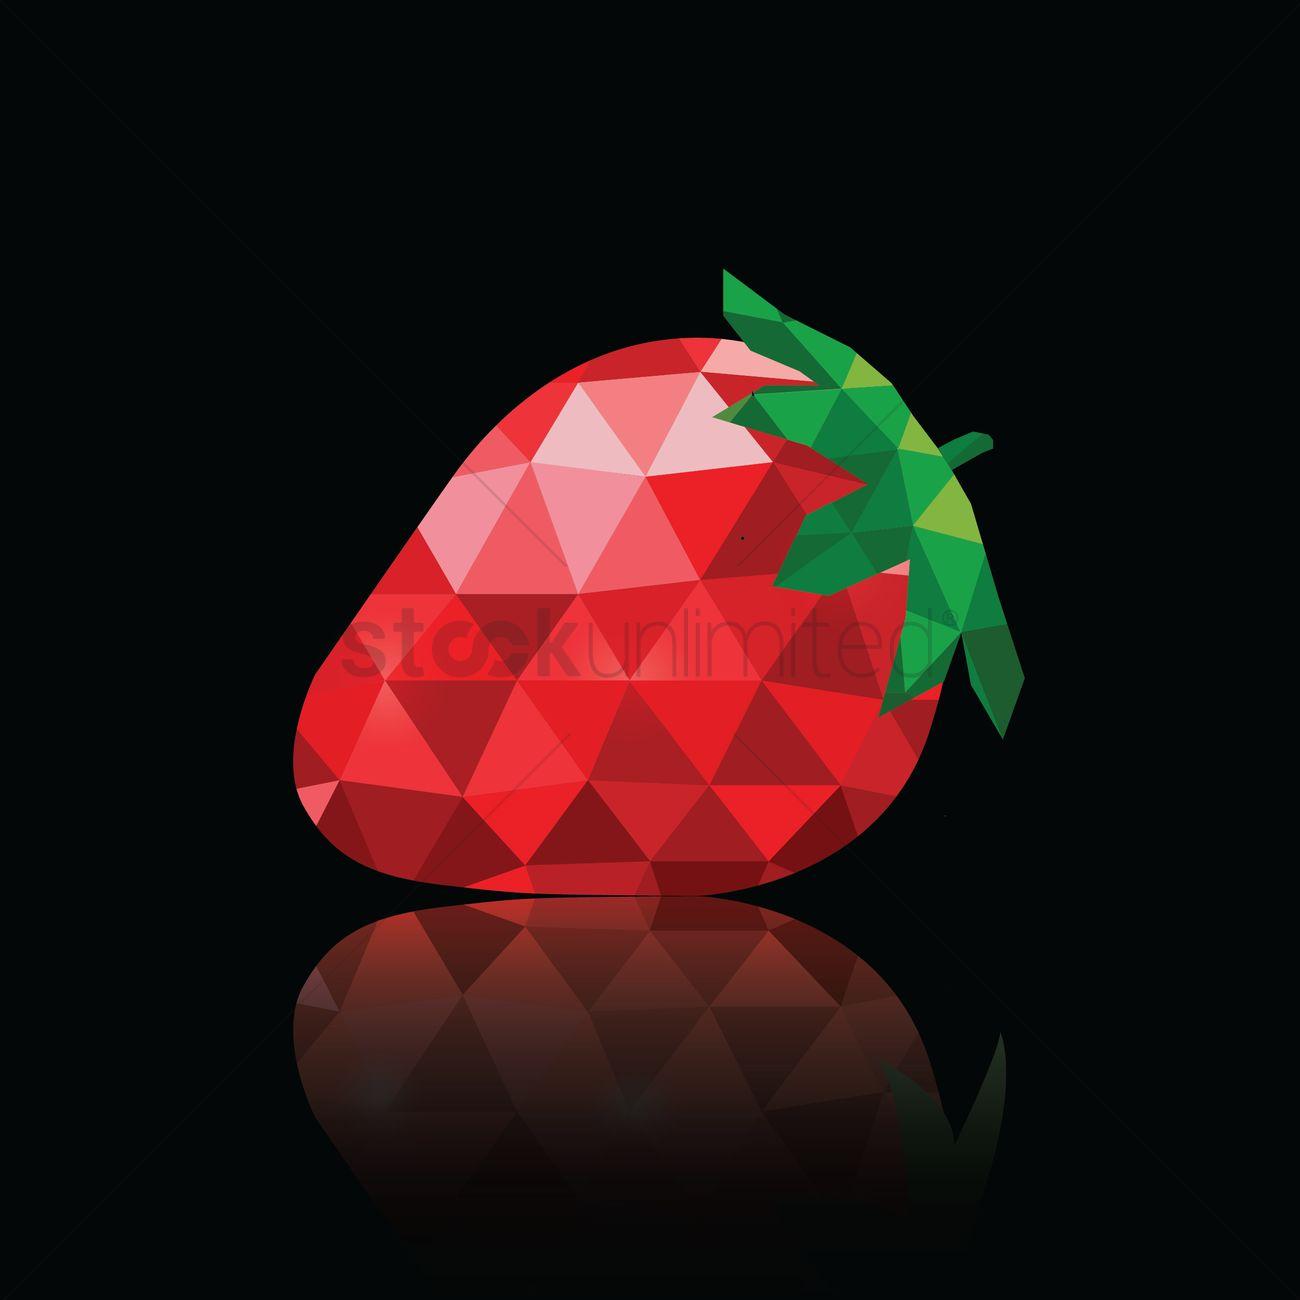 Polygon Strawberry Wallpaper Vector Graphic